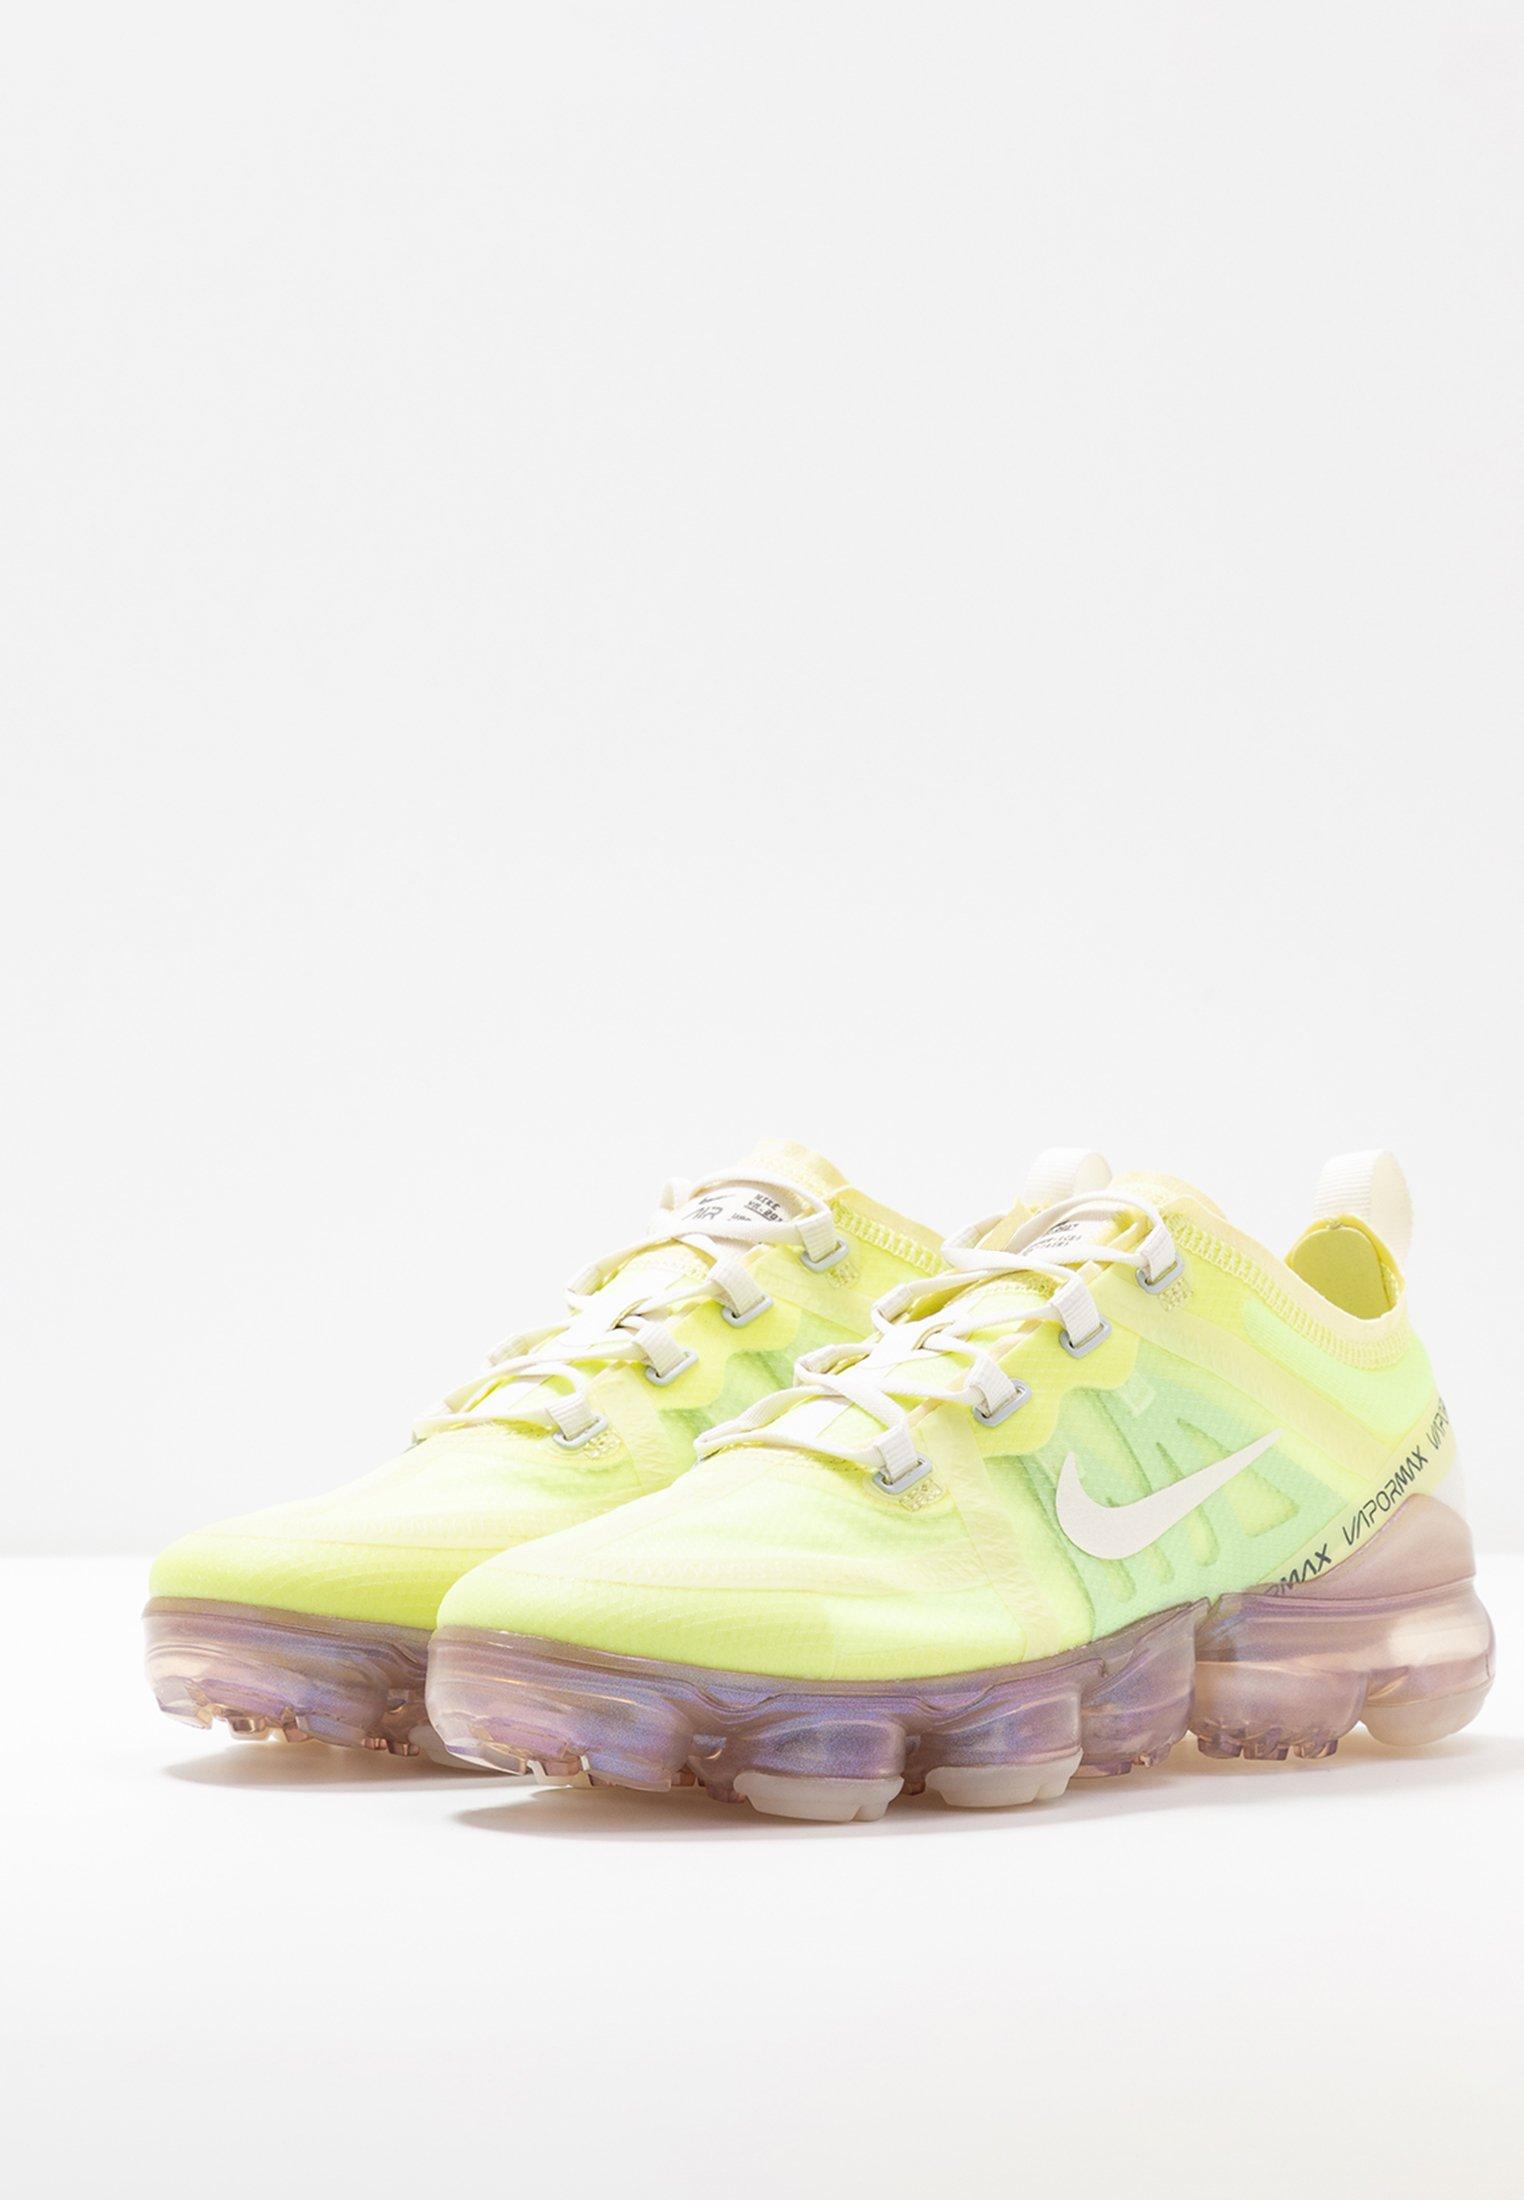 Nike Sportswear AIR VAPORMAX 2019 SE - Baskets basses luminous green/phantom/metallic sepia stone